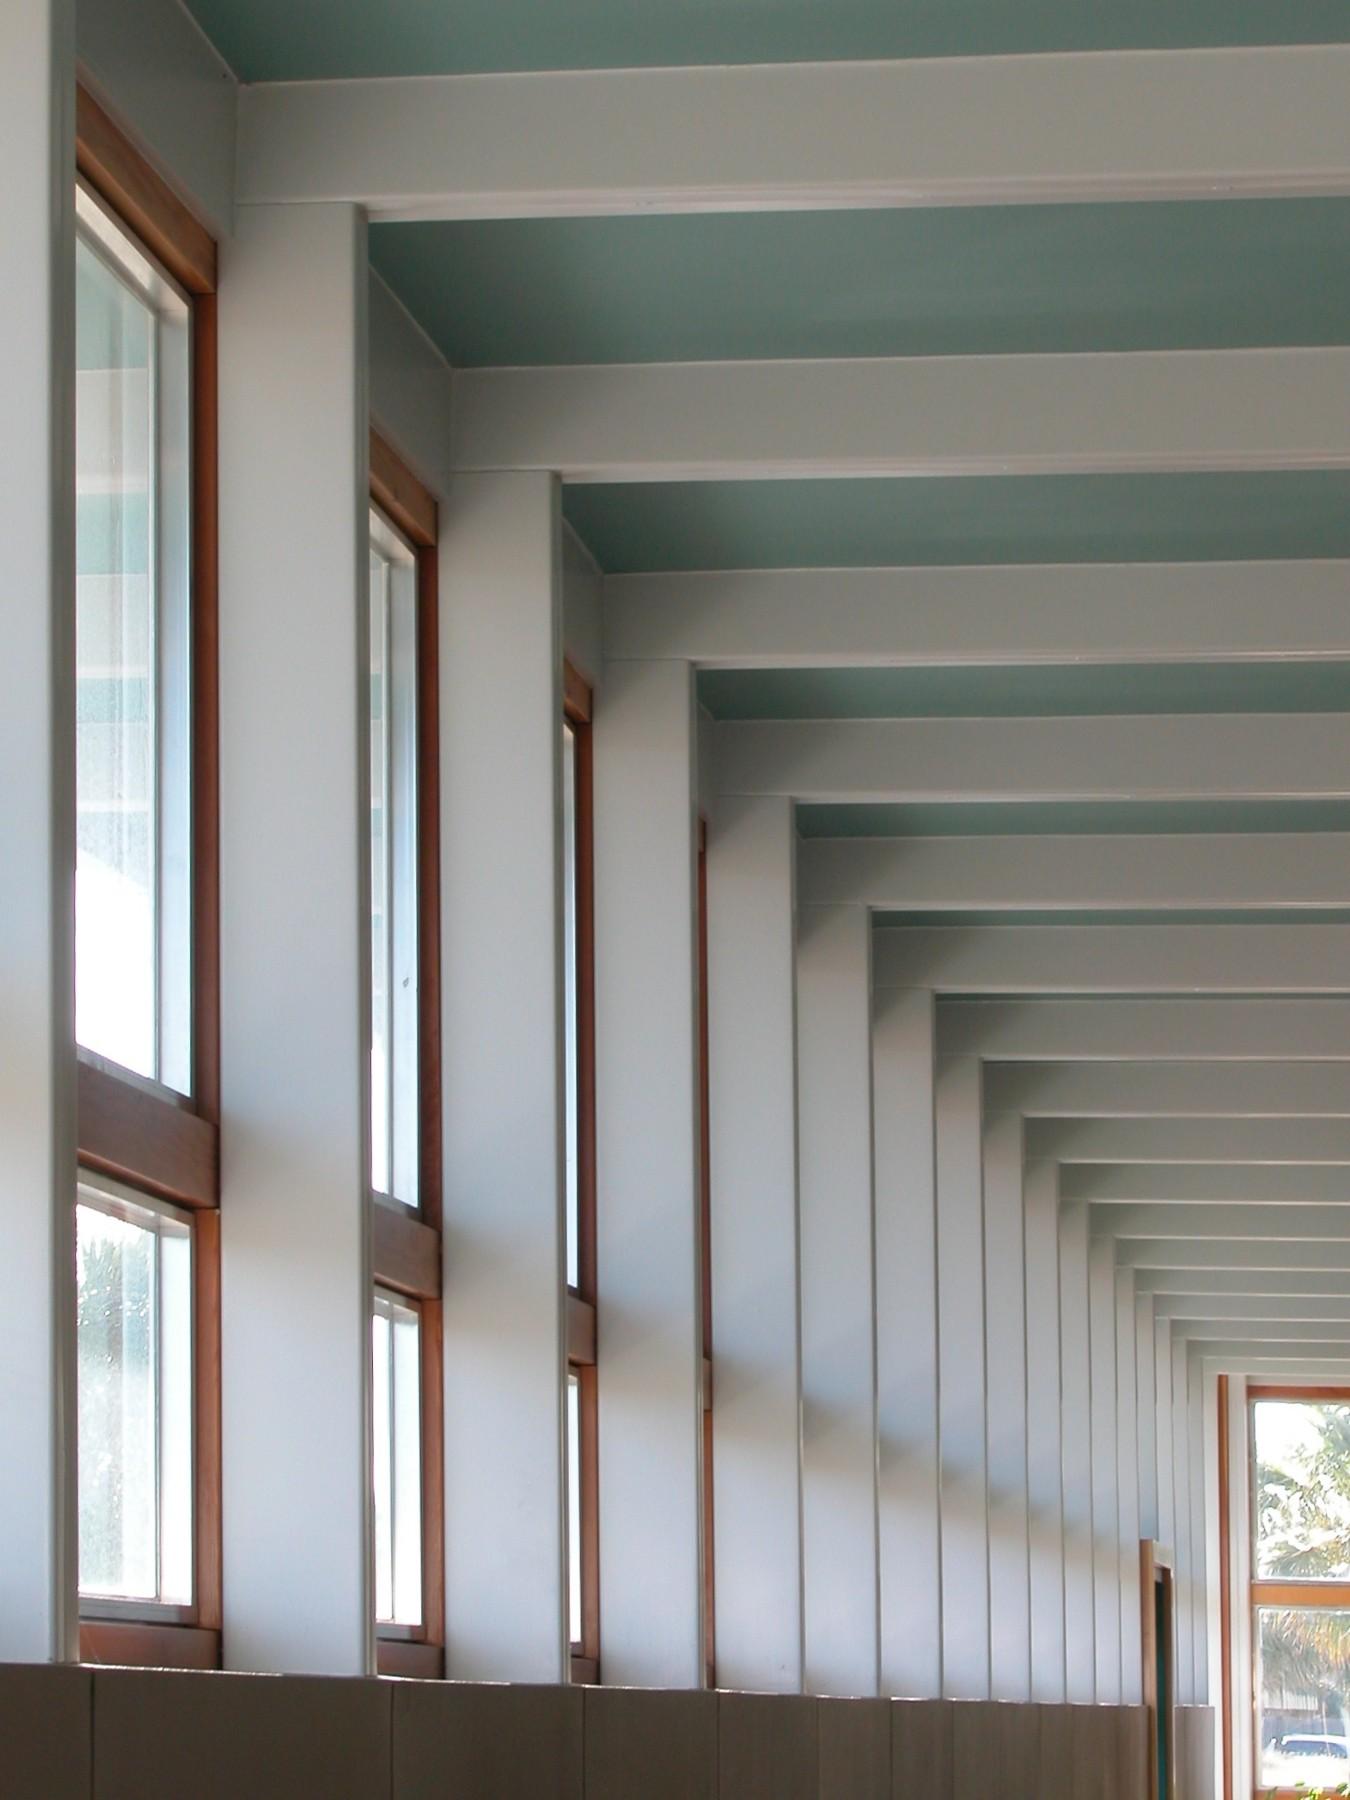 gouverne building window-colonnade.jpg